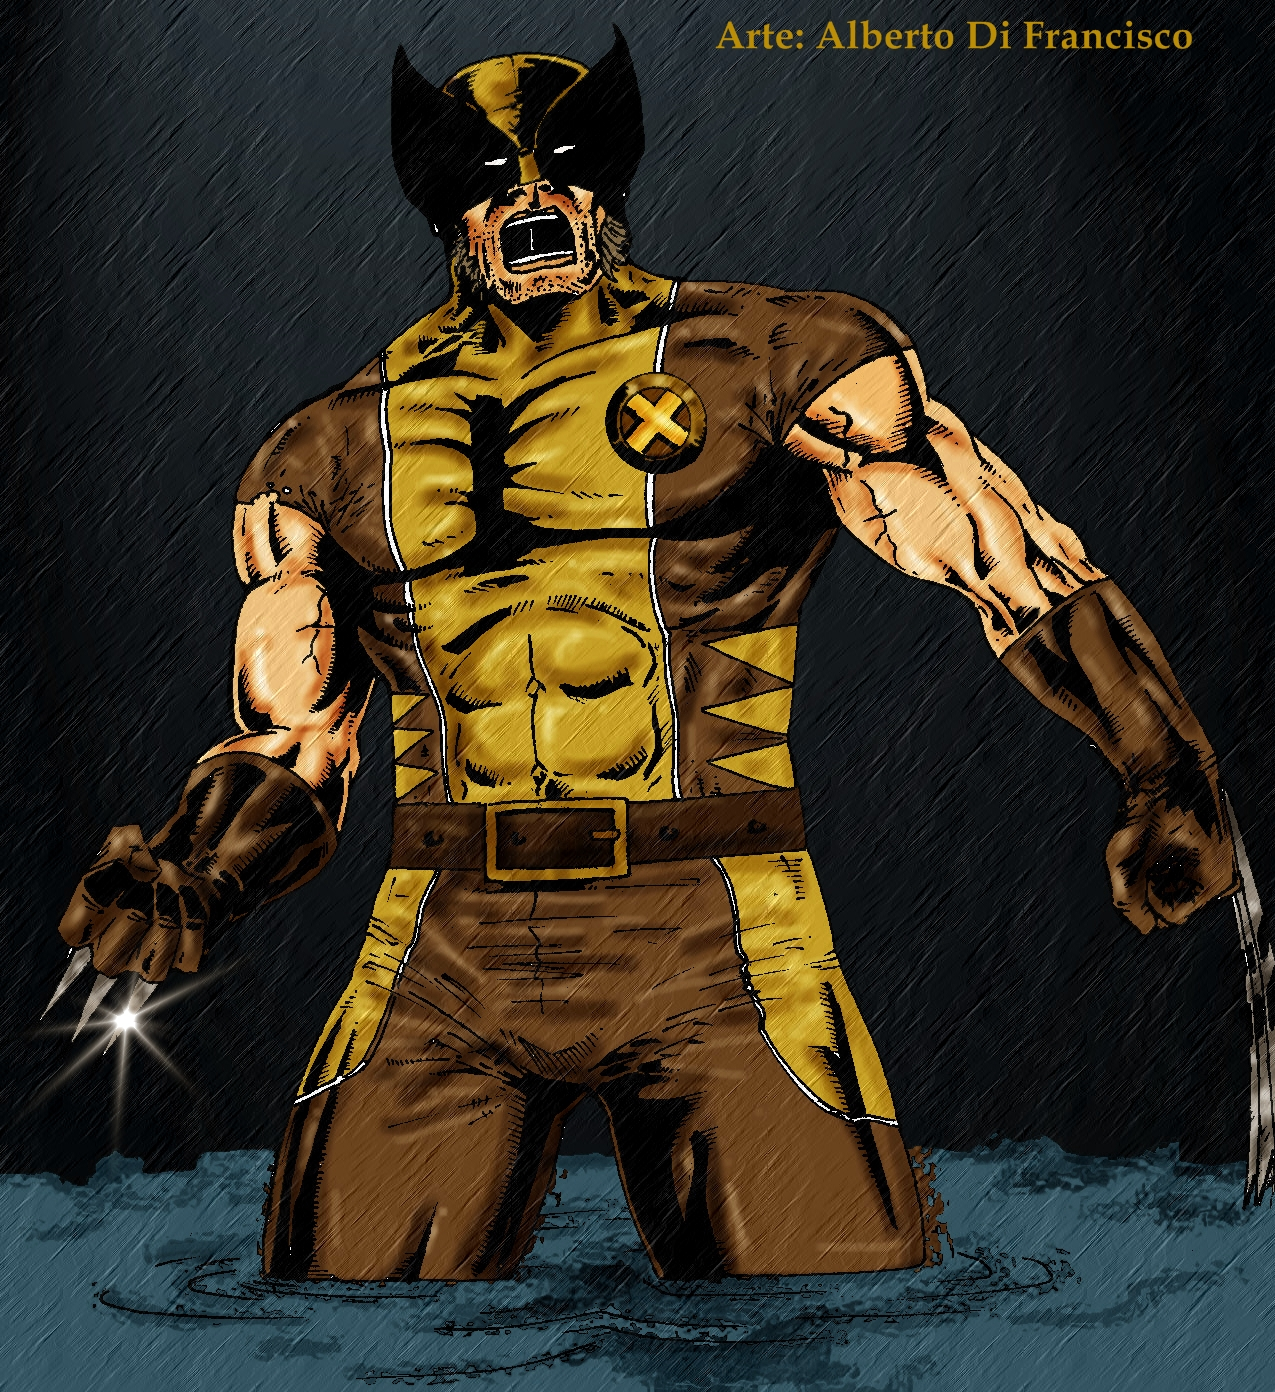 http://3.bp.blogspot.com/-Azt04z2zxQA/UKZJRN-tngI/AAAAAAAAA6I/uRtwjEcbEqg/s1600/Wolverine+old+costume.jpg